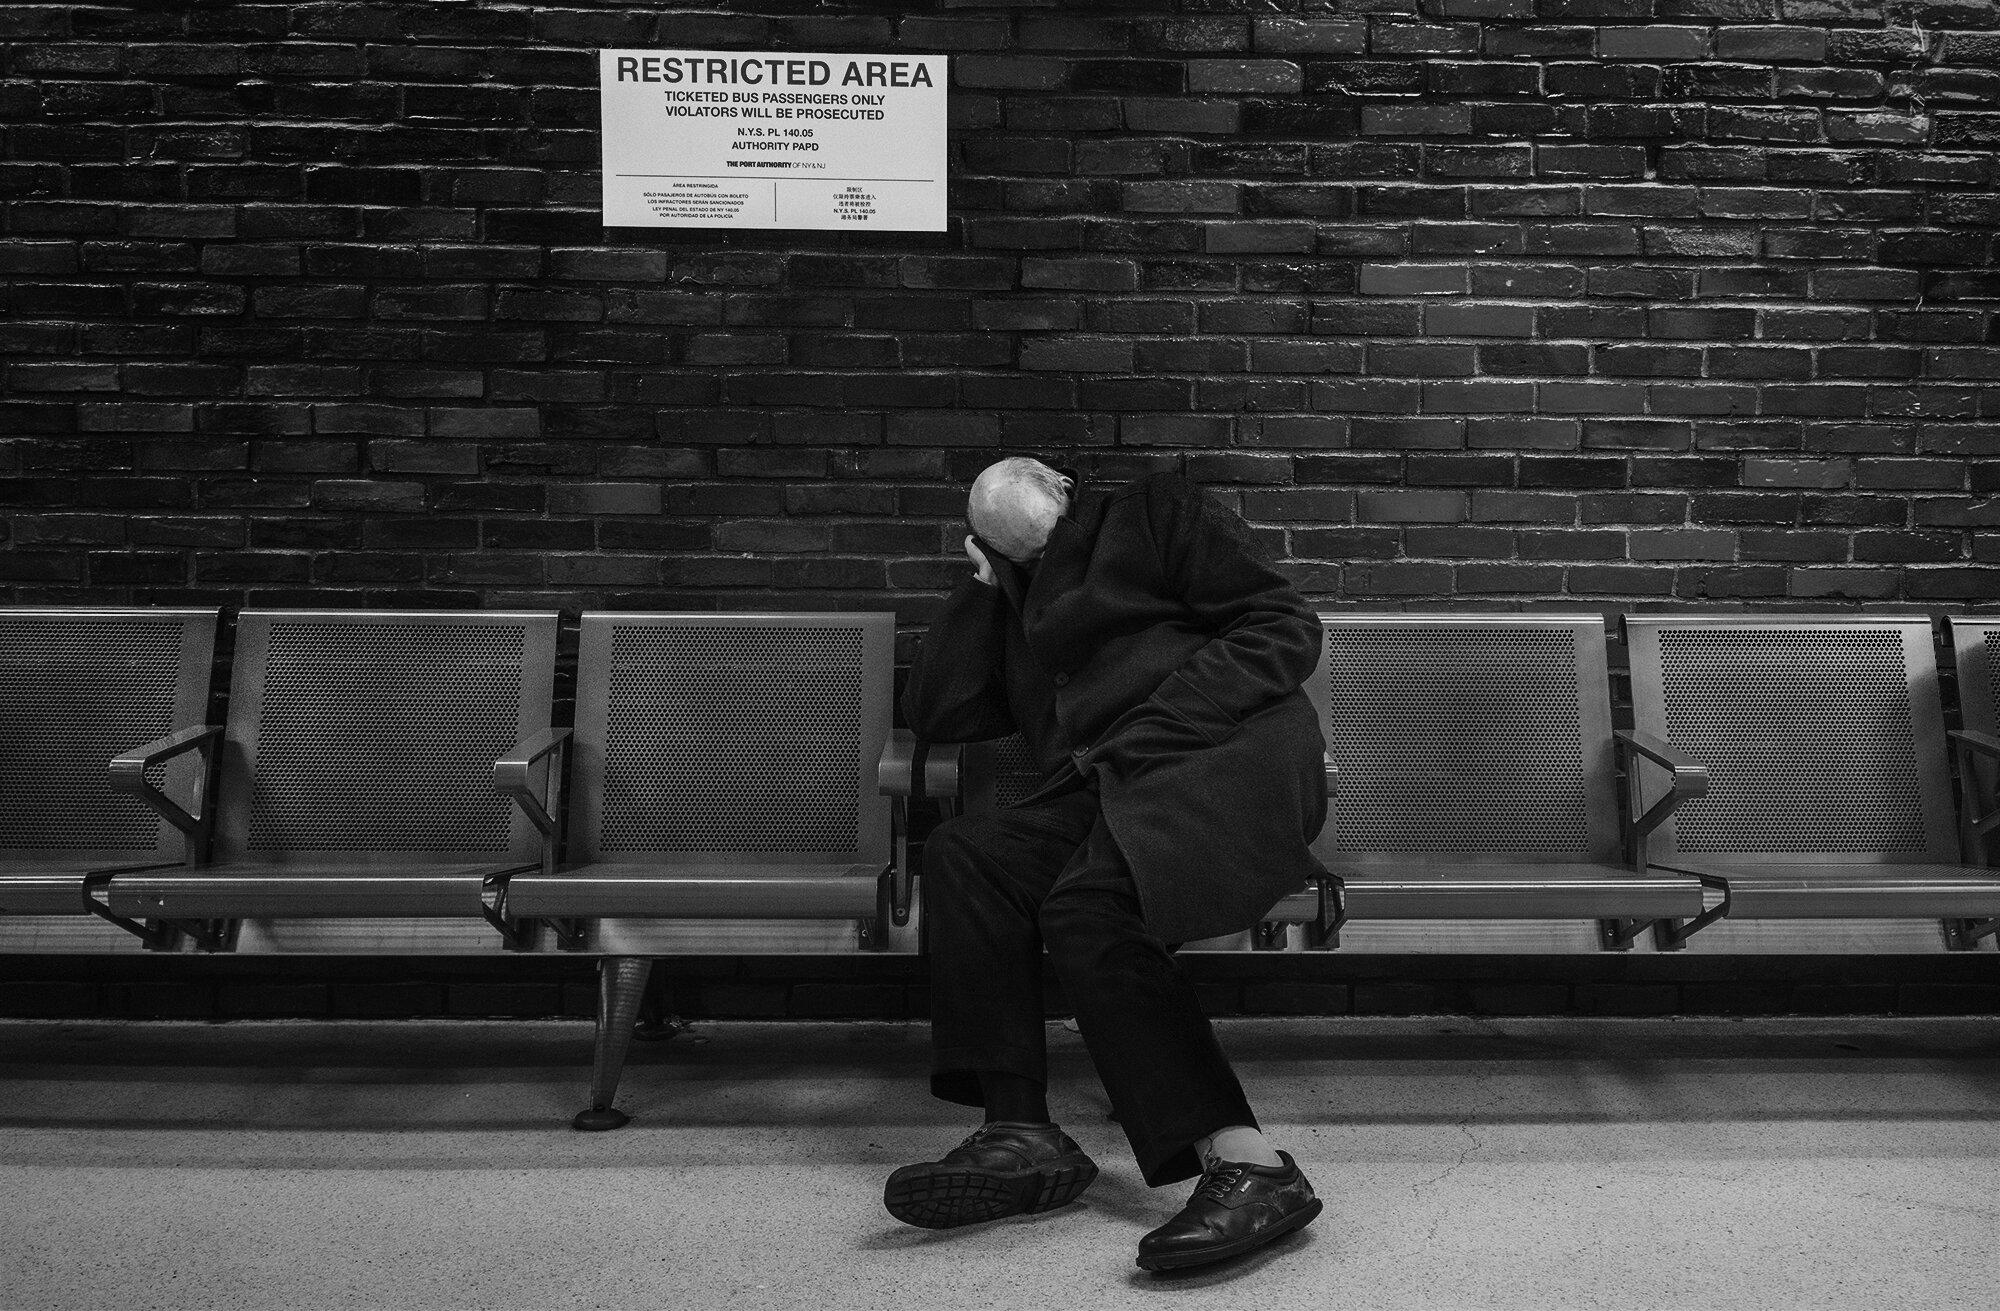 Port_Authority_Sleeping_Man-026.jpg